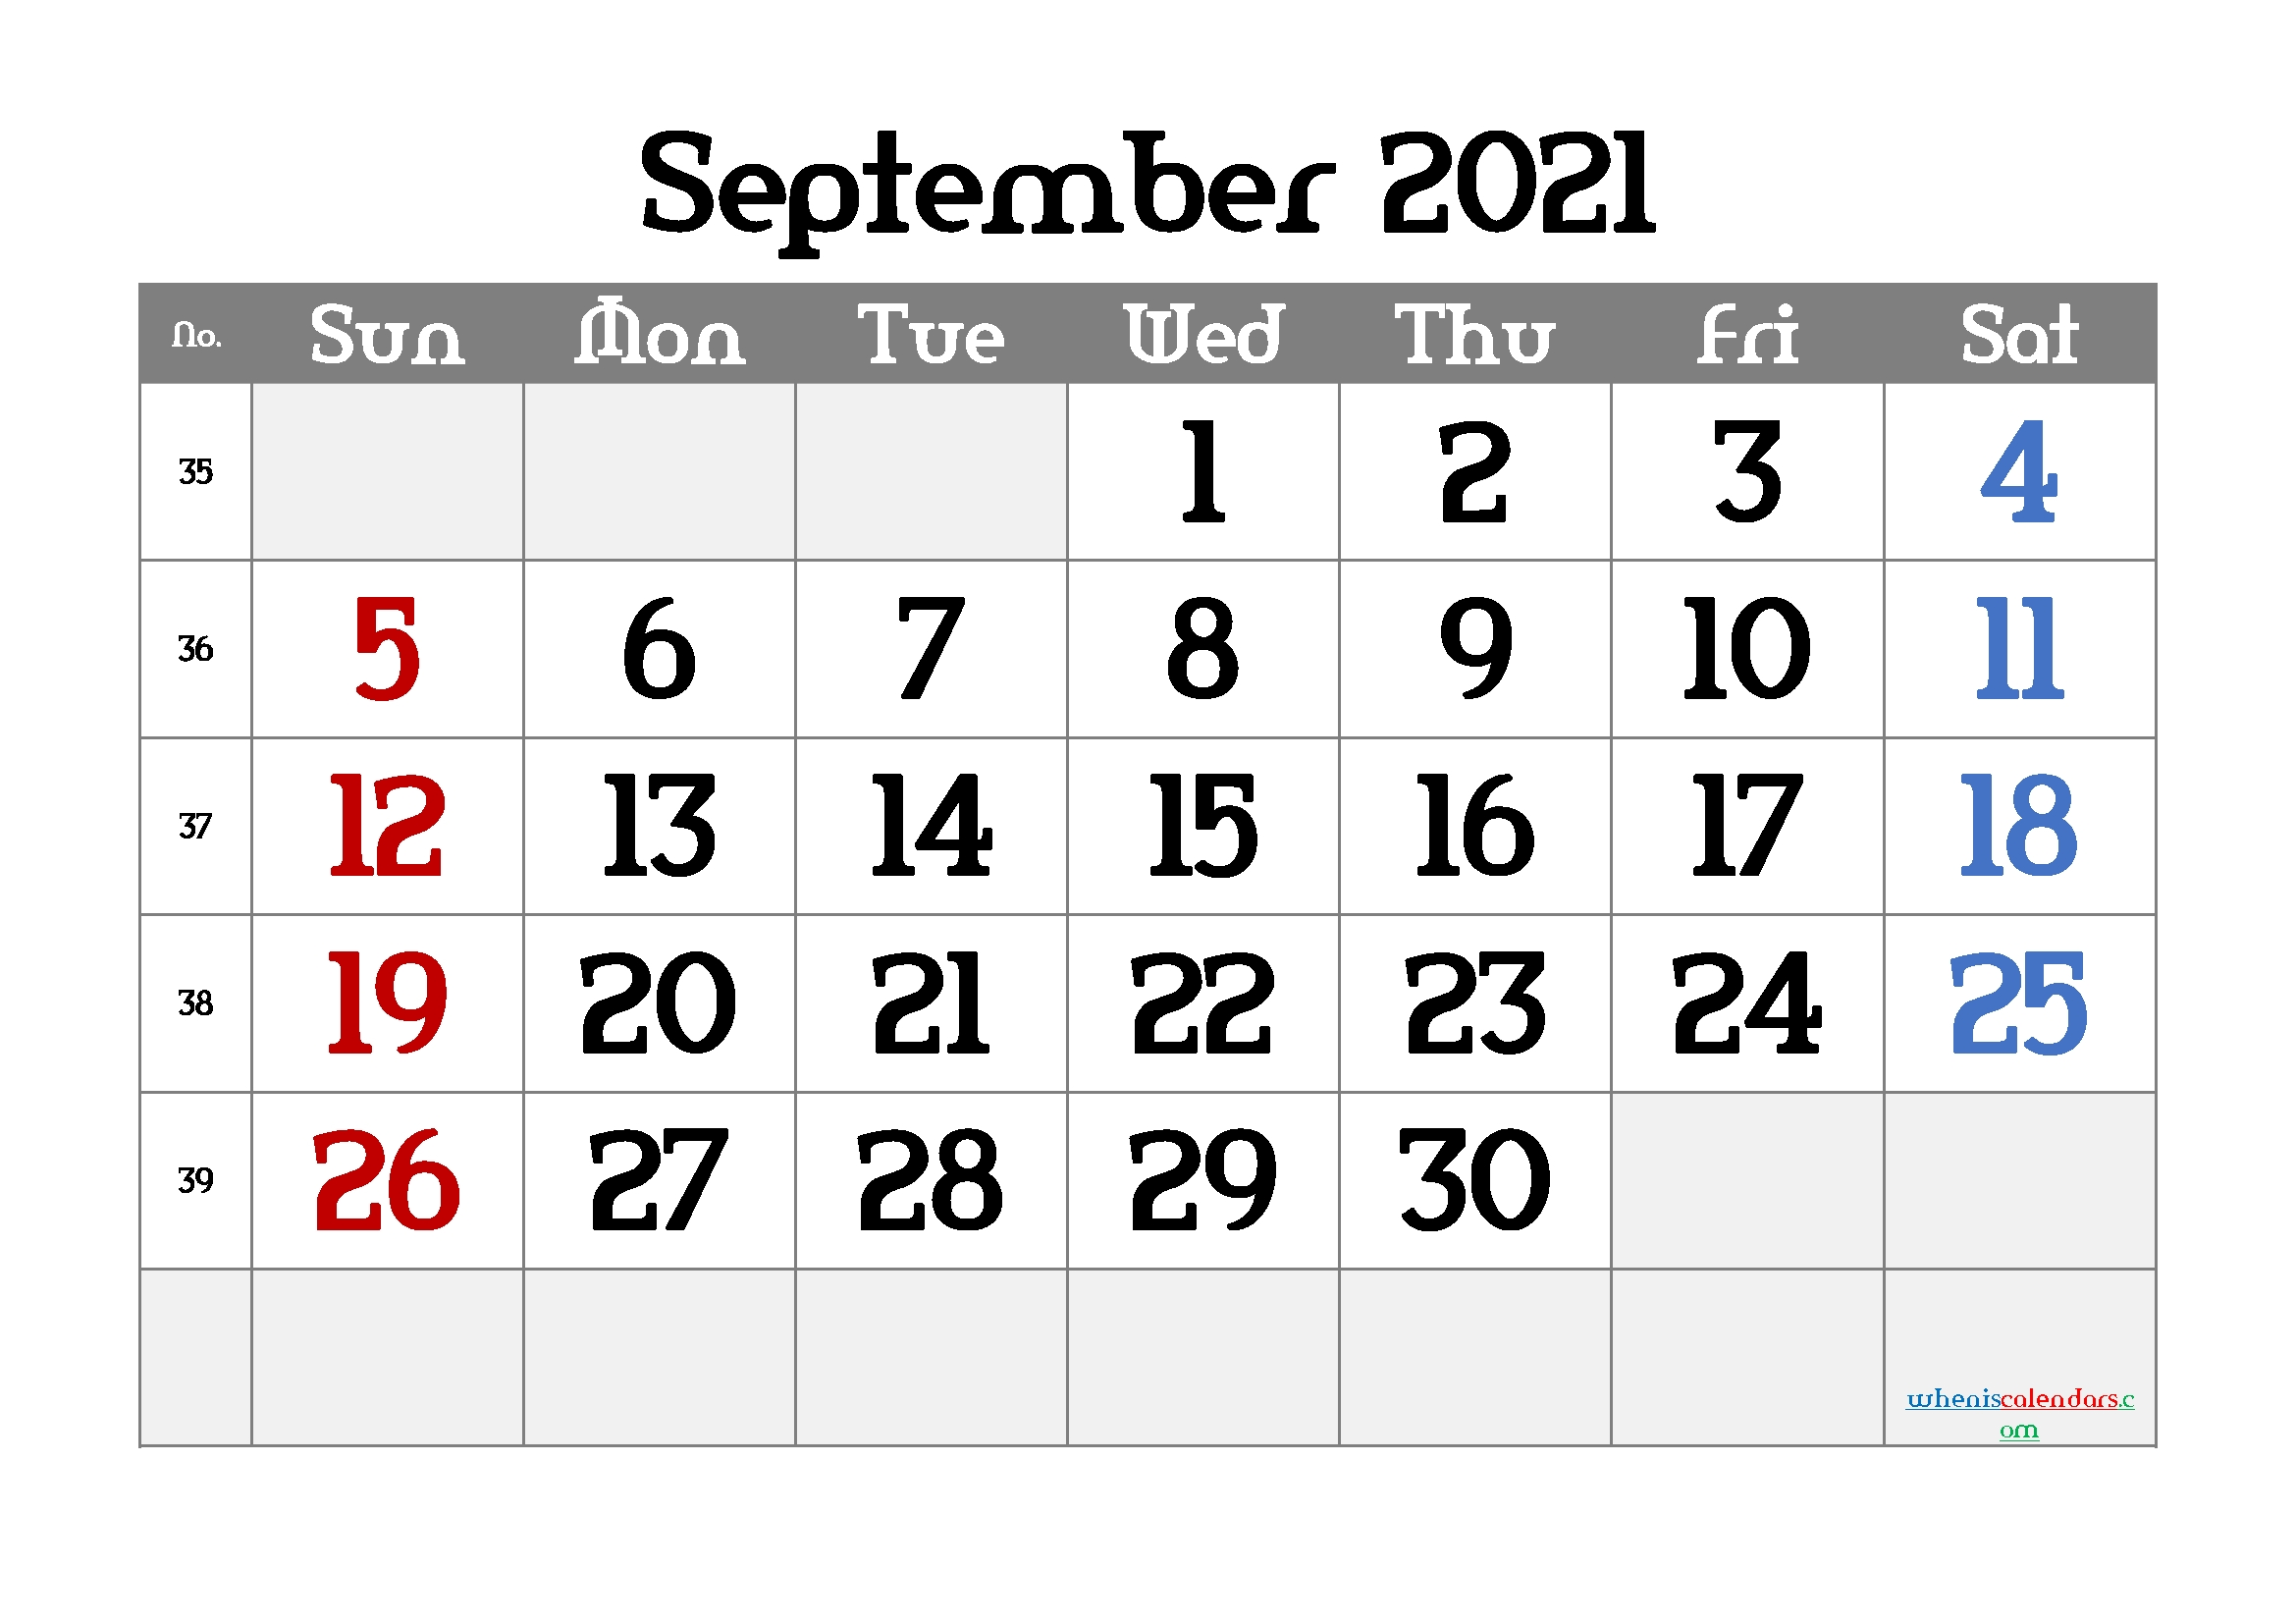 Free Printable September 2021 Calendar September 2021 Calendar With Holidays Printable